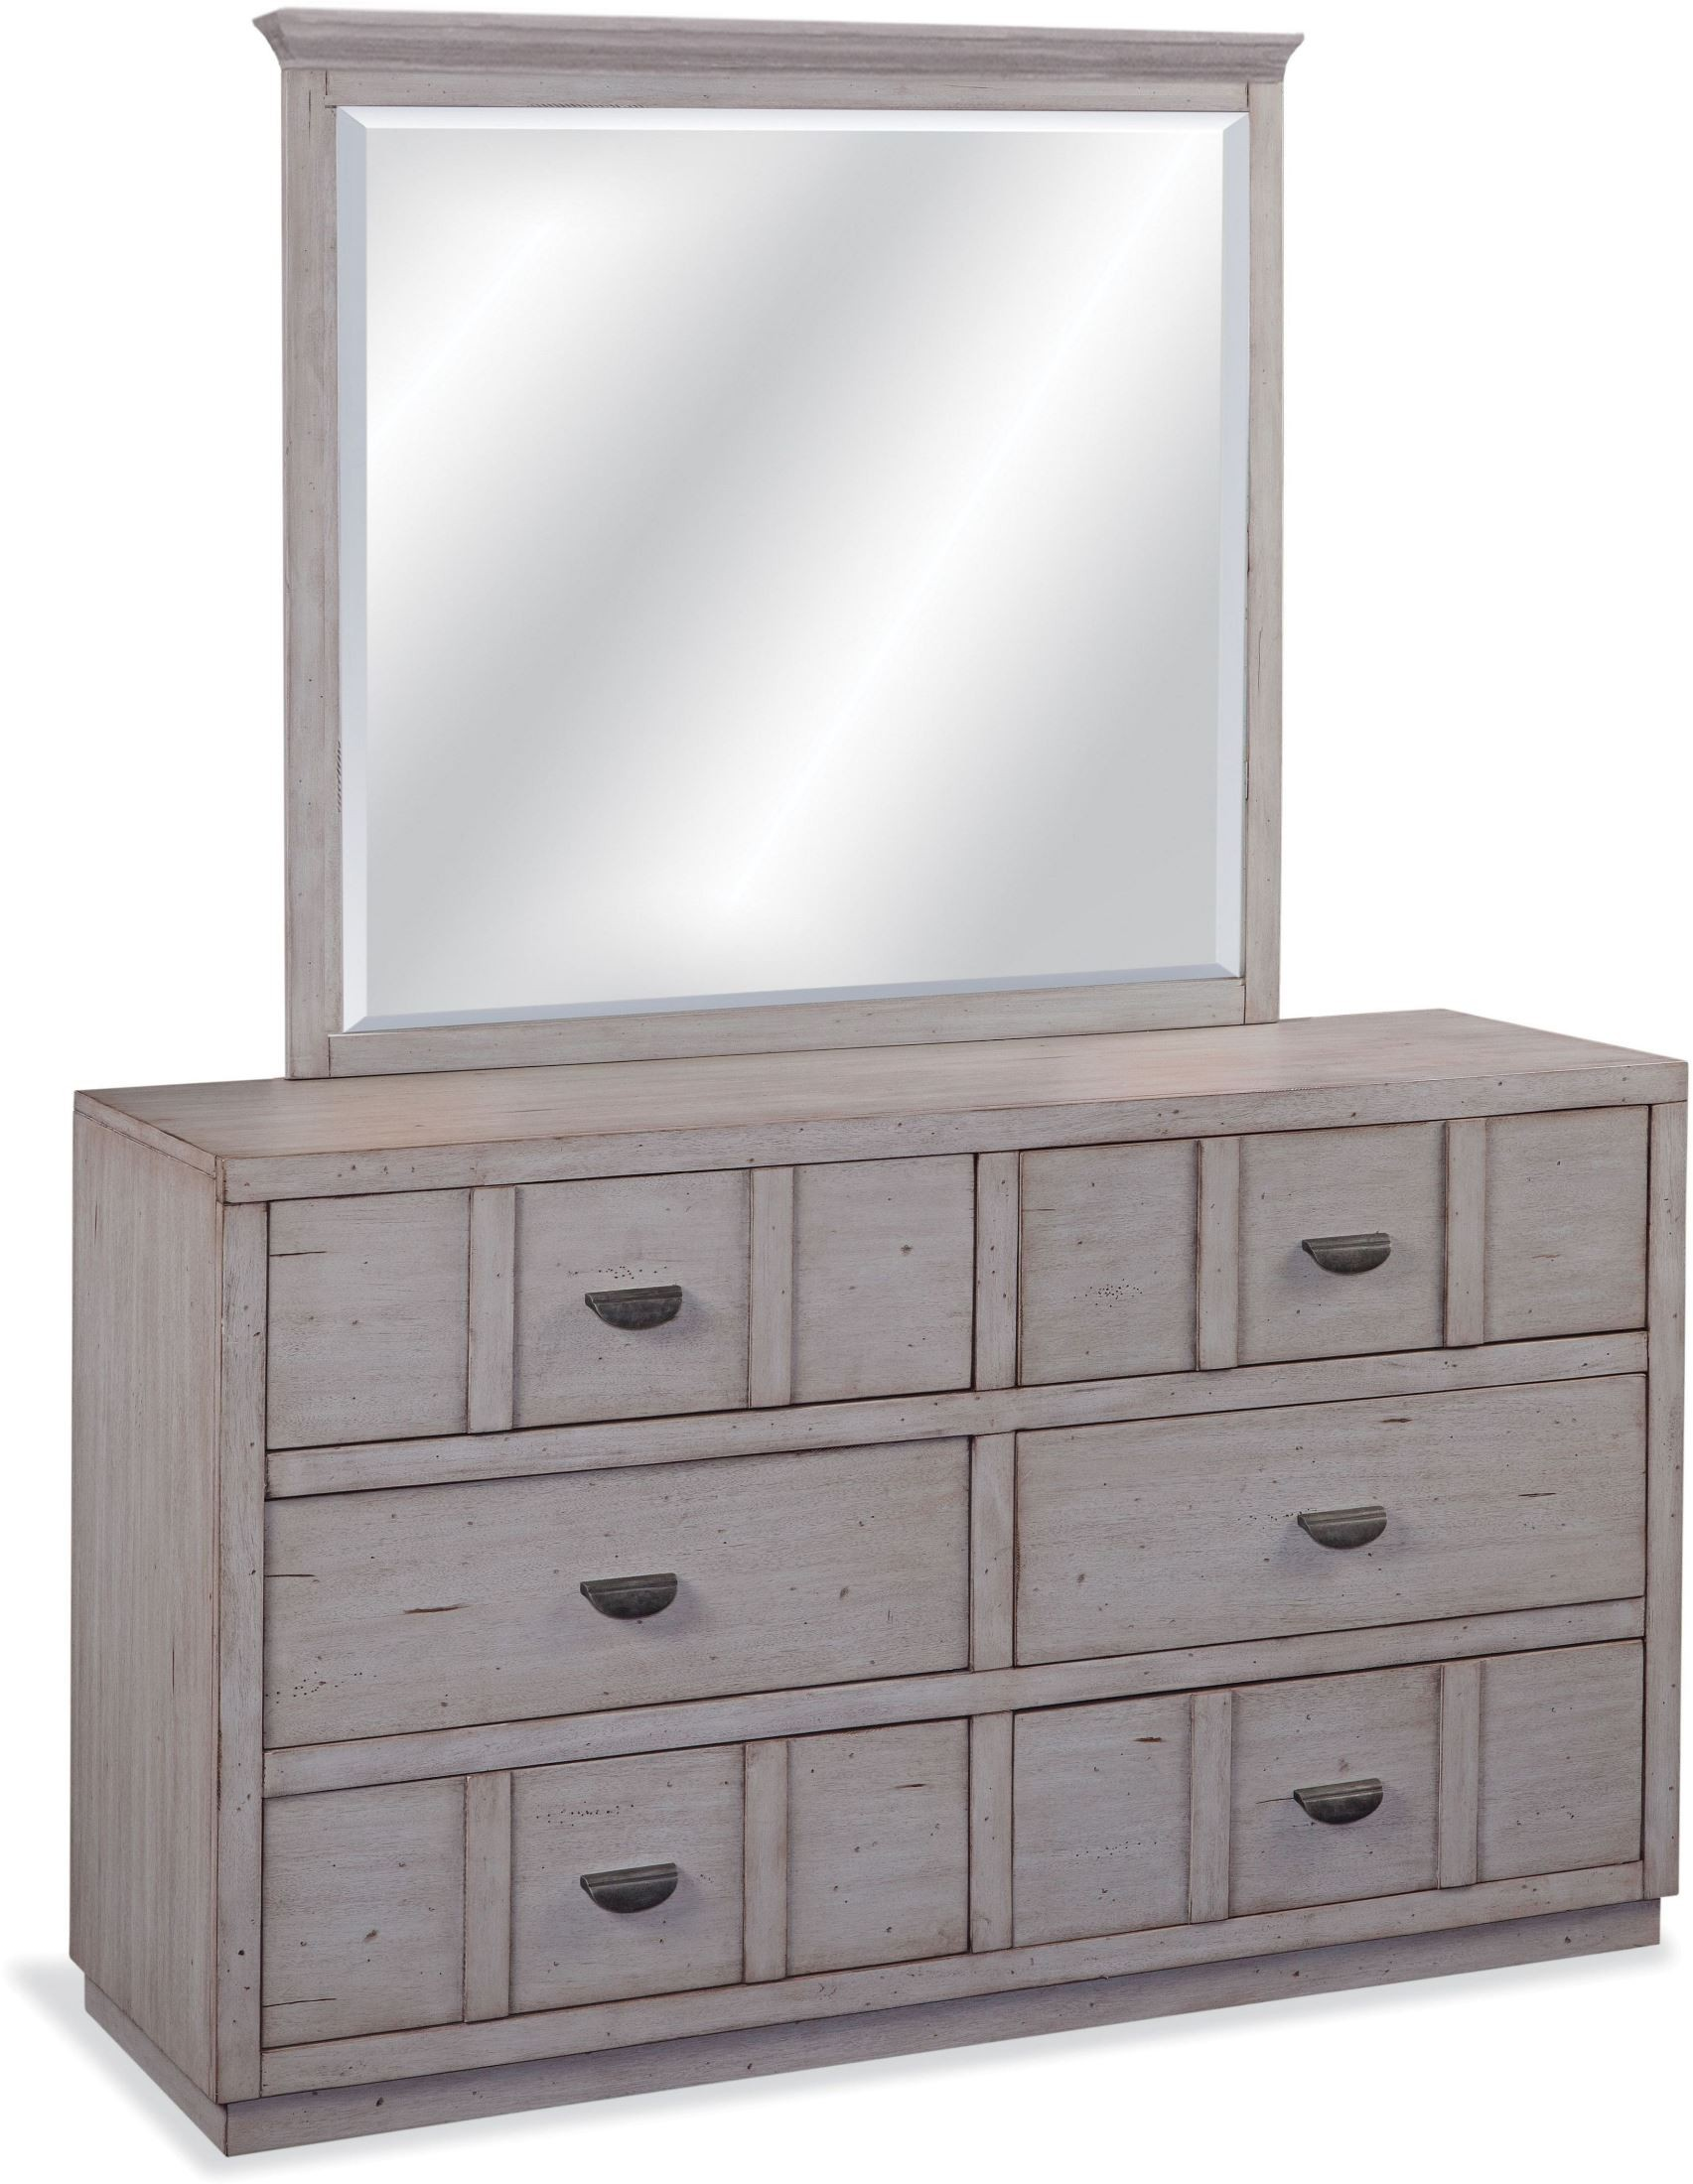 Provo Driftwood Patina Youth Panel Bedroom Set, 7300-970-972-875 ...